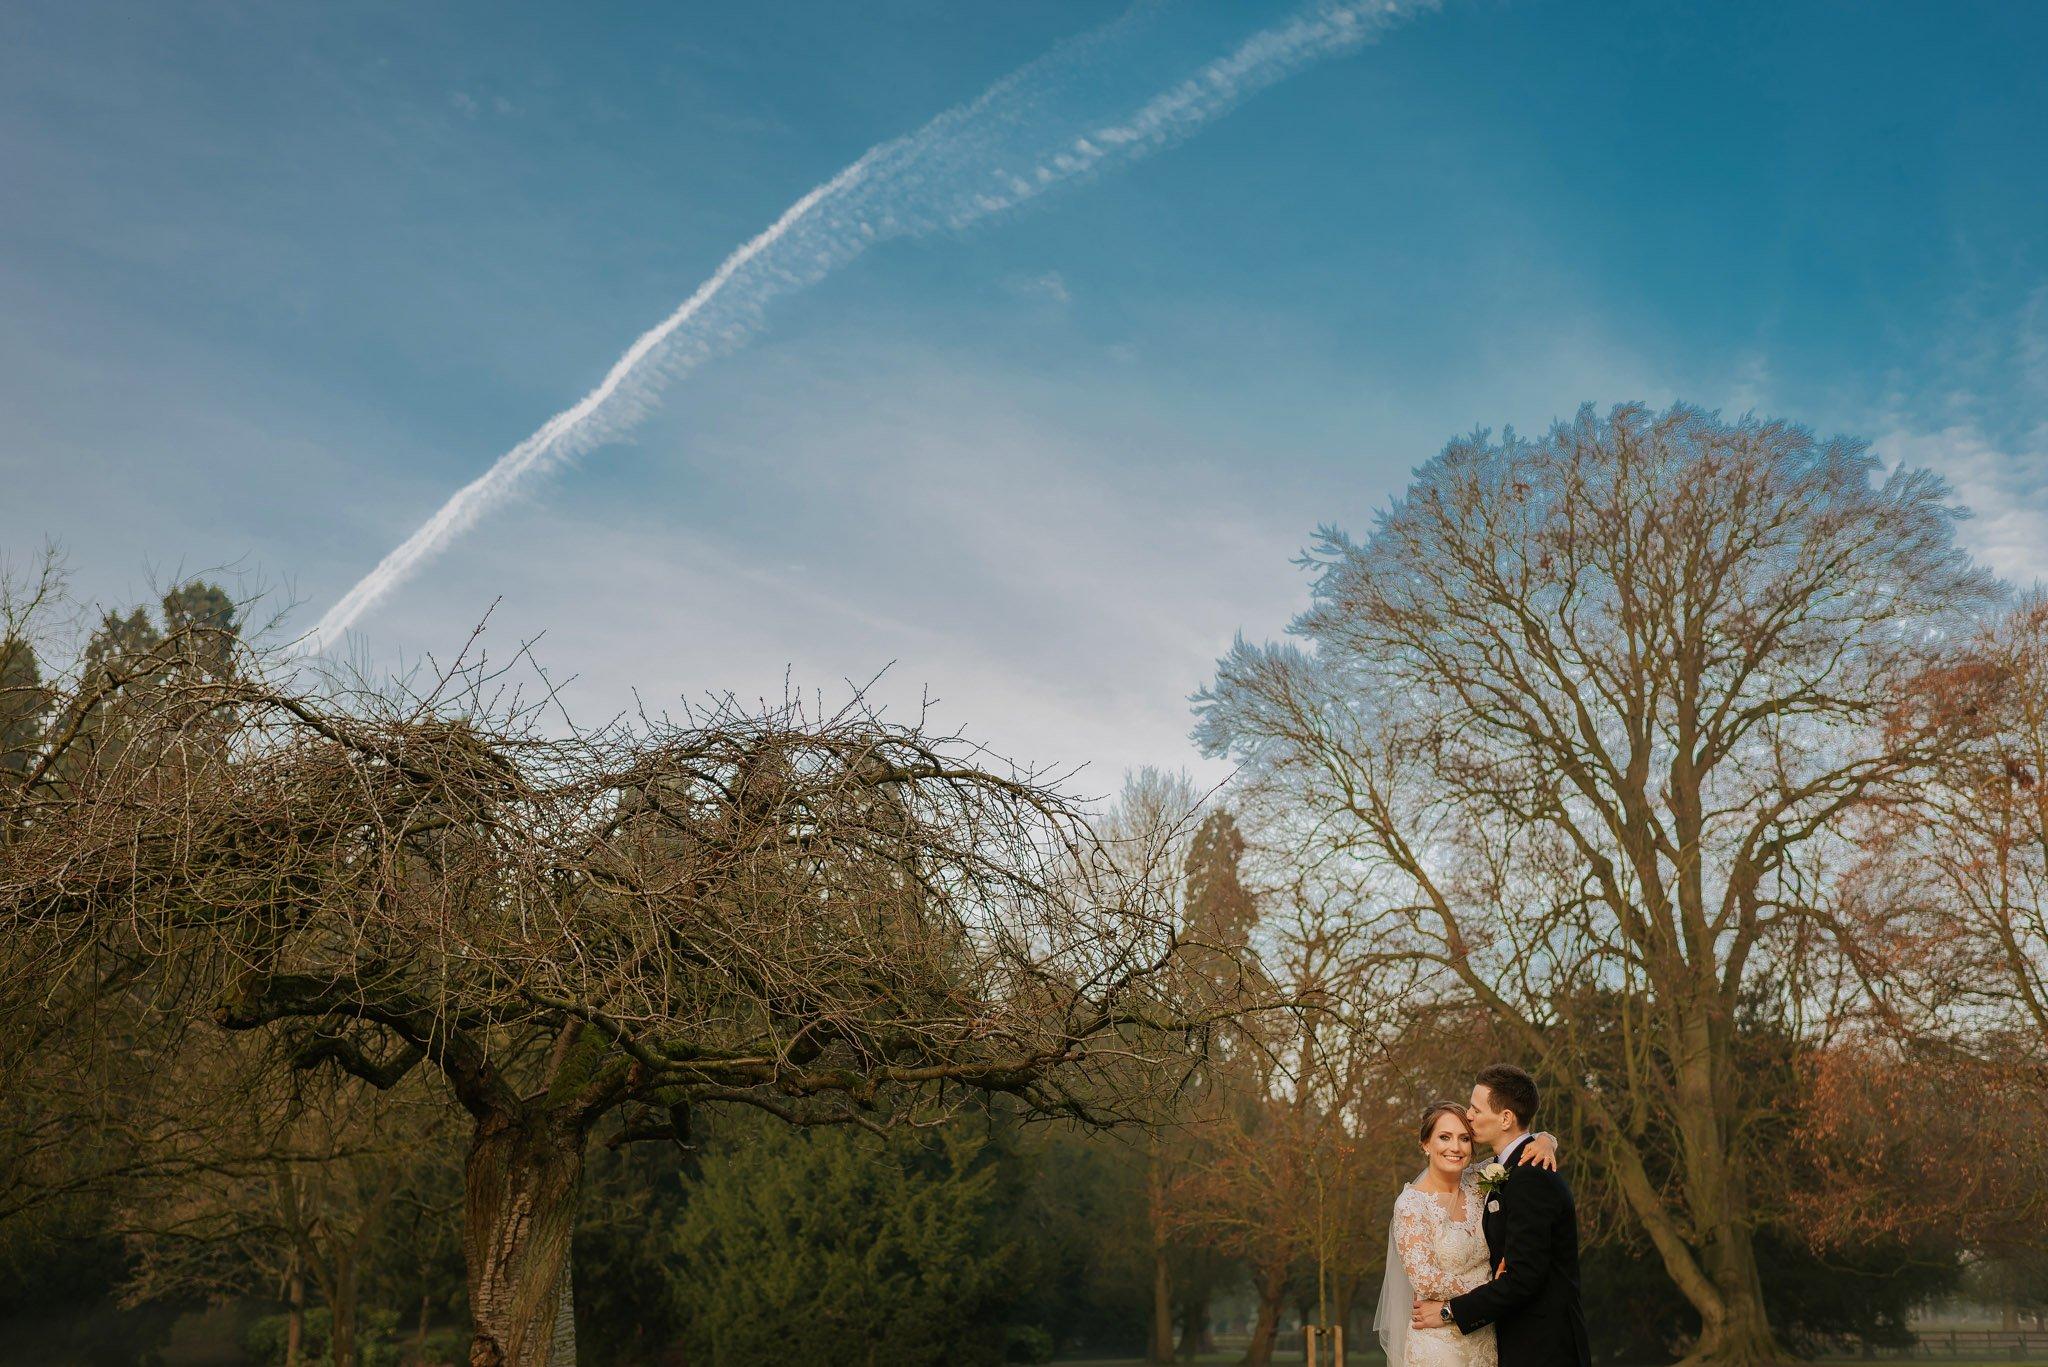 Coombe Abbey wedding in Coventry, Warwickshire - Sam + Matt 30